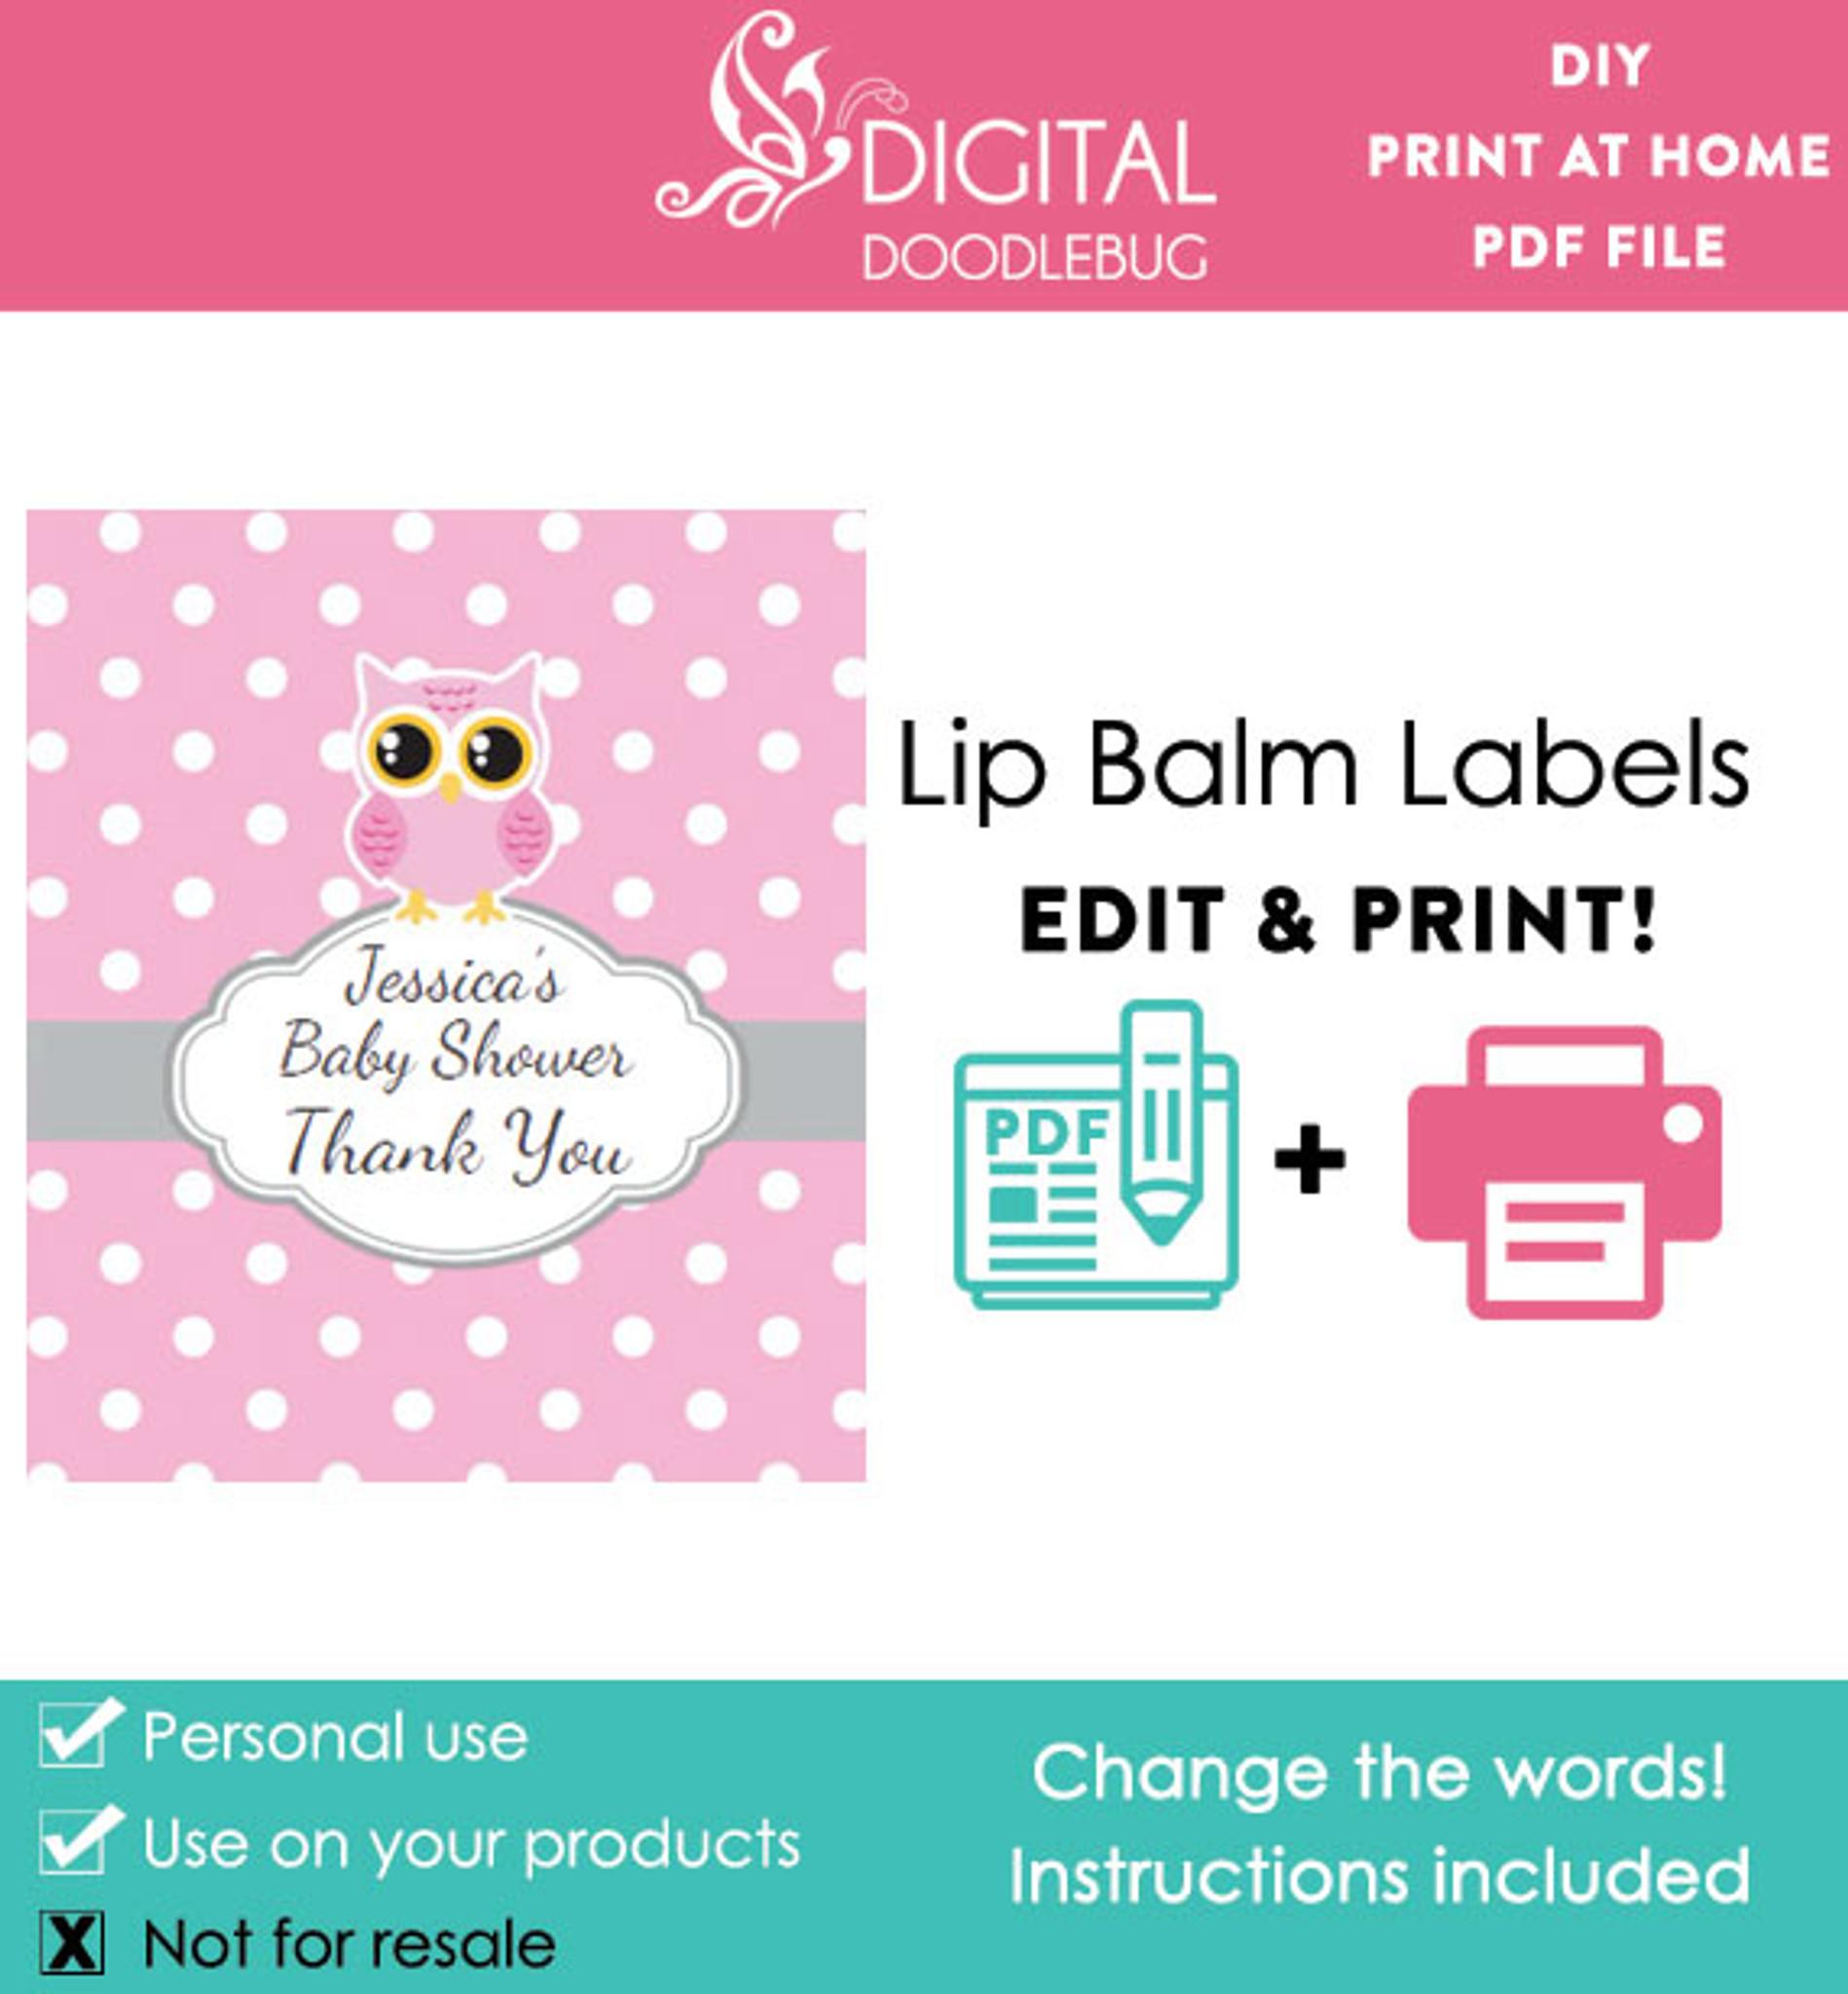 photograph about Printable Lip Balm Labels identified as Crimson Owl Printable Lip Balm Labels